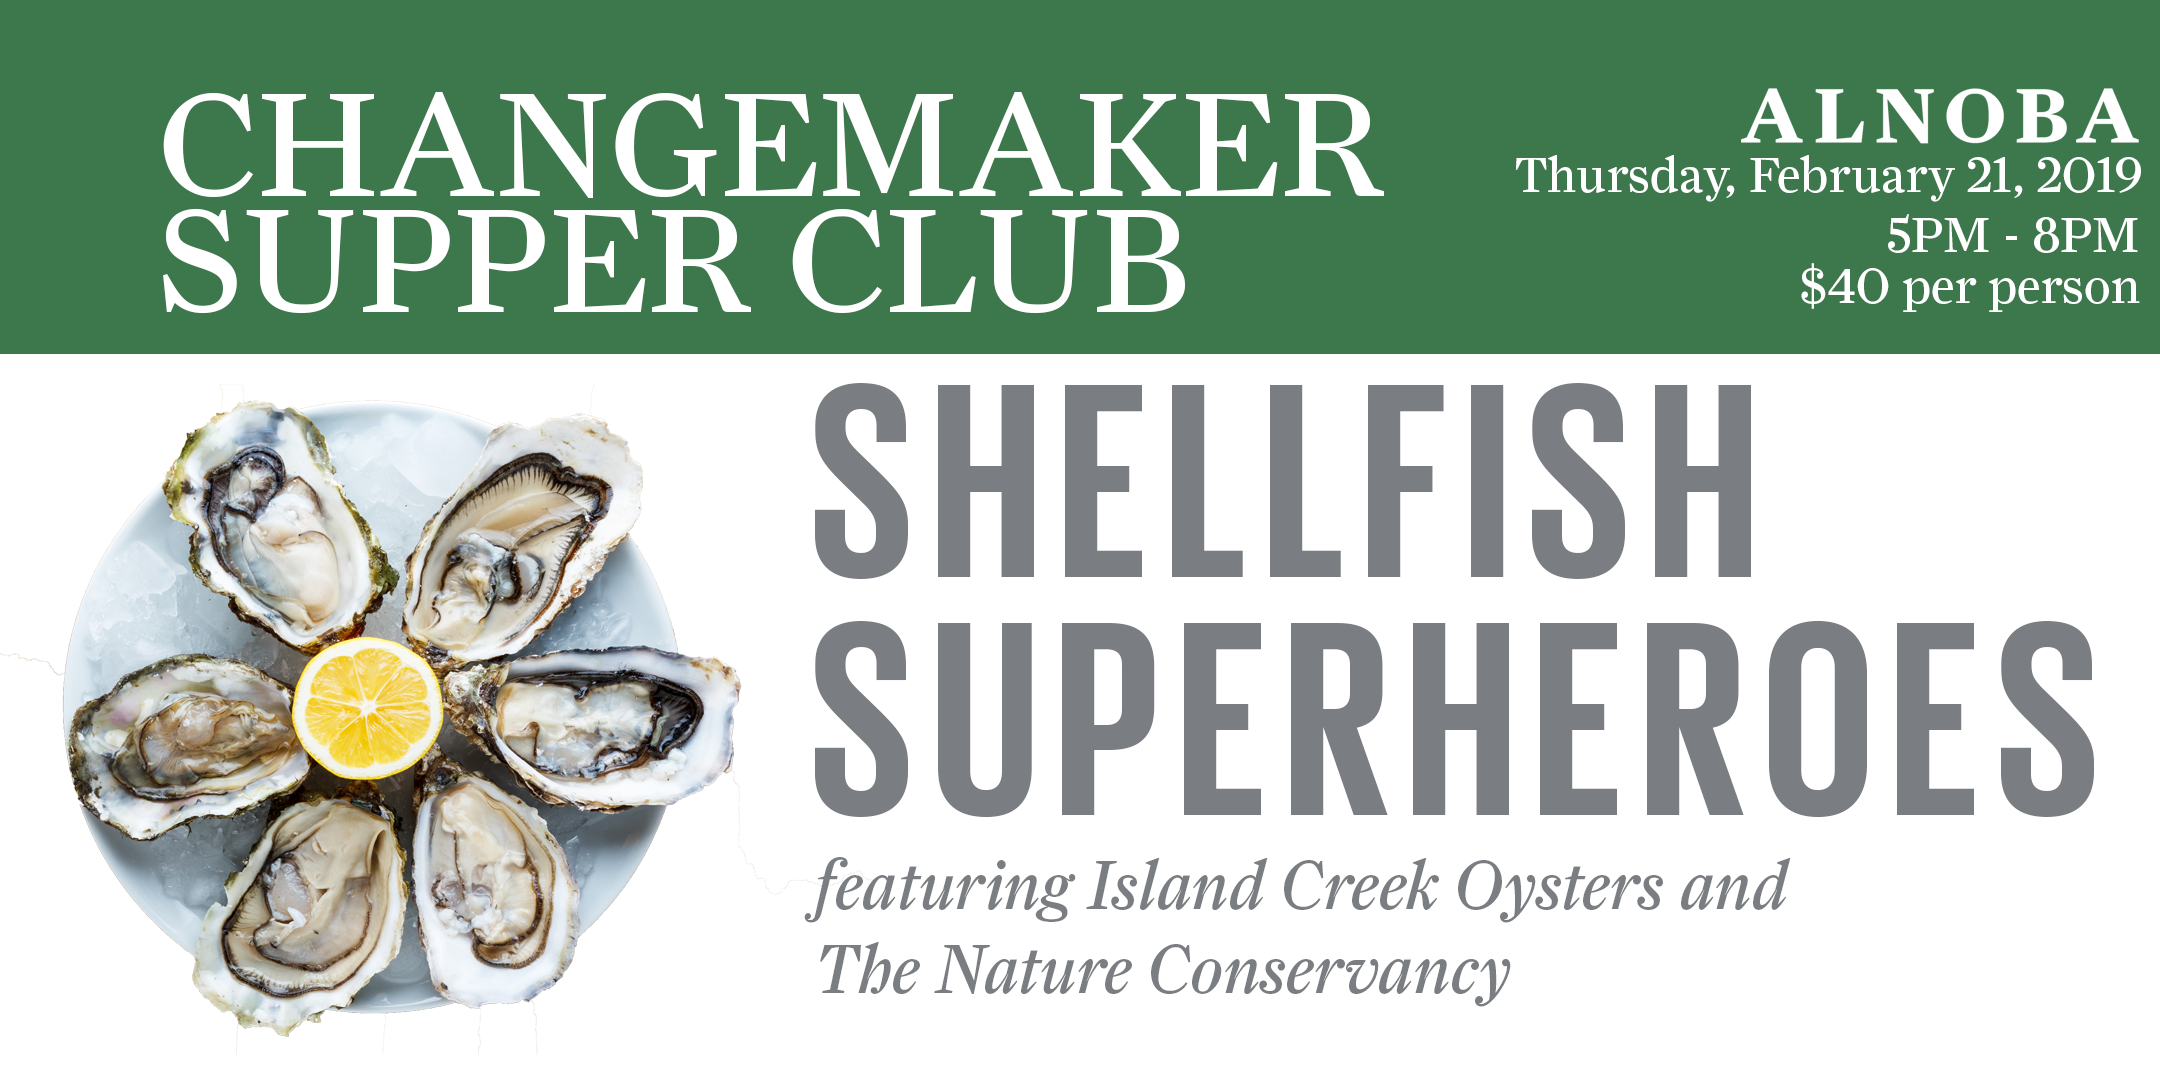 ChangeMaker Supper Club: Shellfish Superheroes